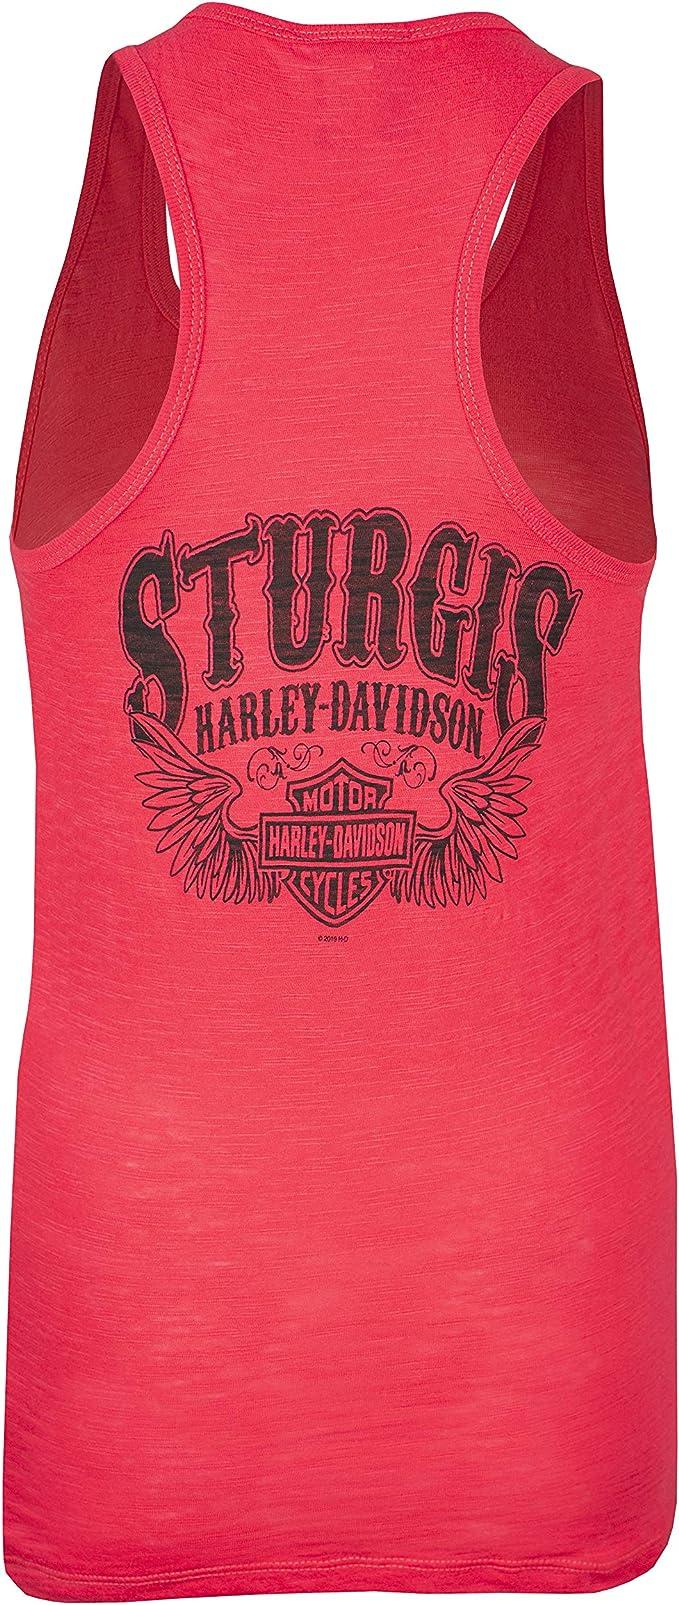 Washed Black Harley-Davidson Women/'s Embellished Reign Sleeveless Tank Top